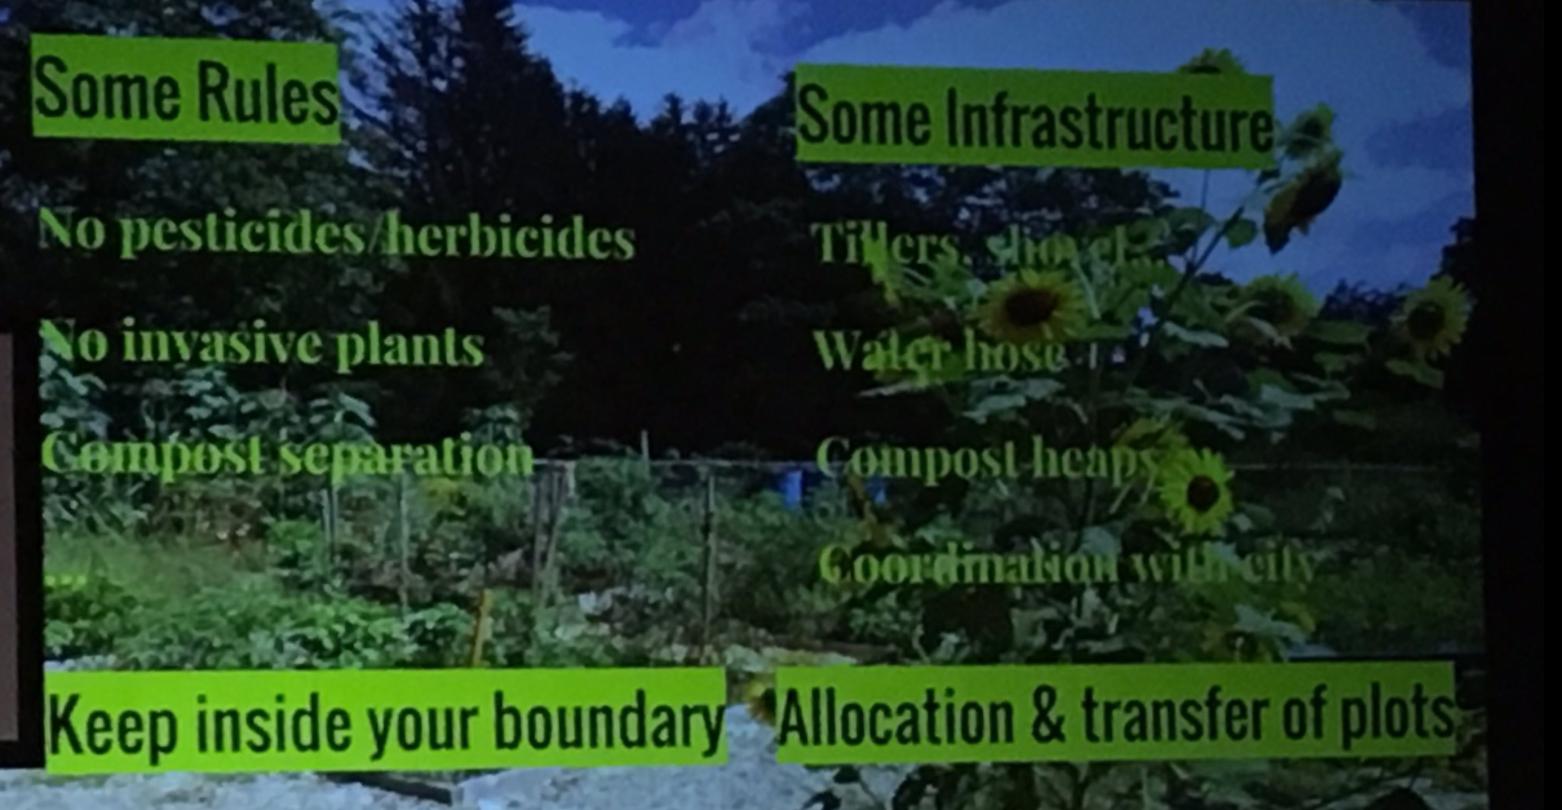 Community garden basic rules